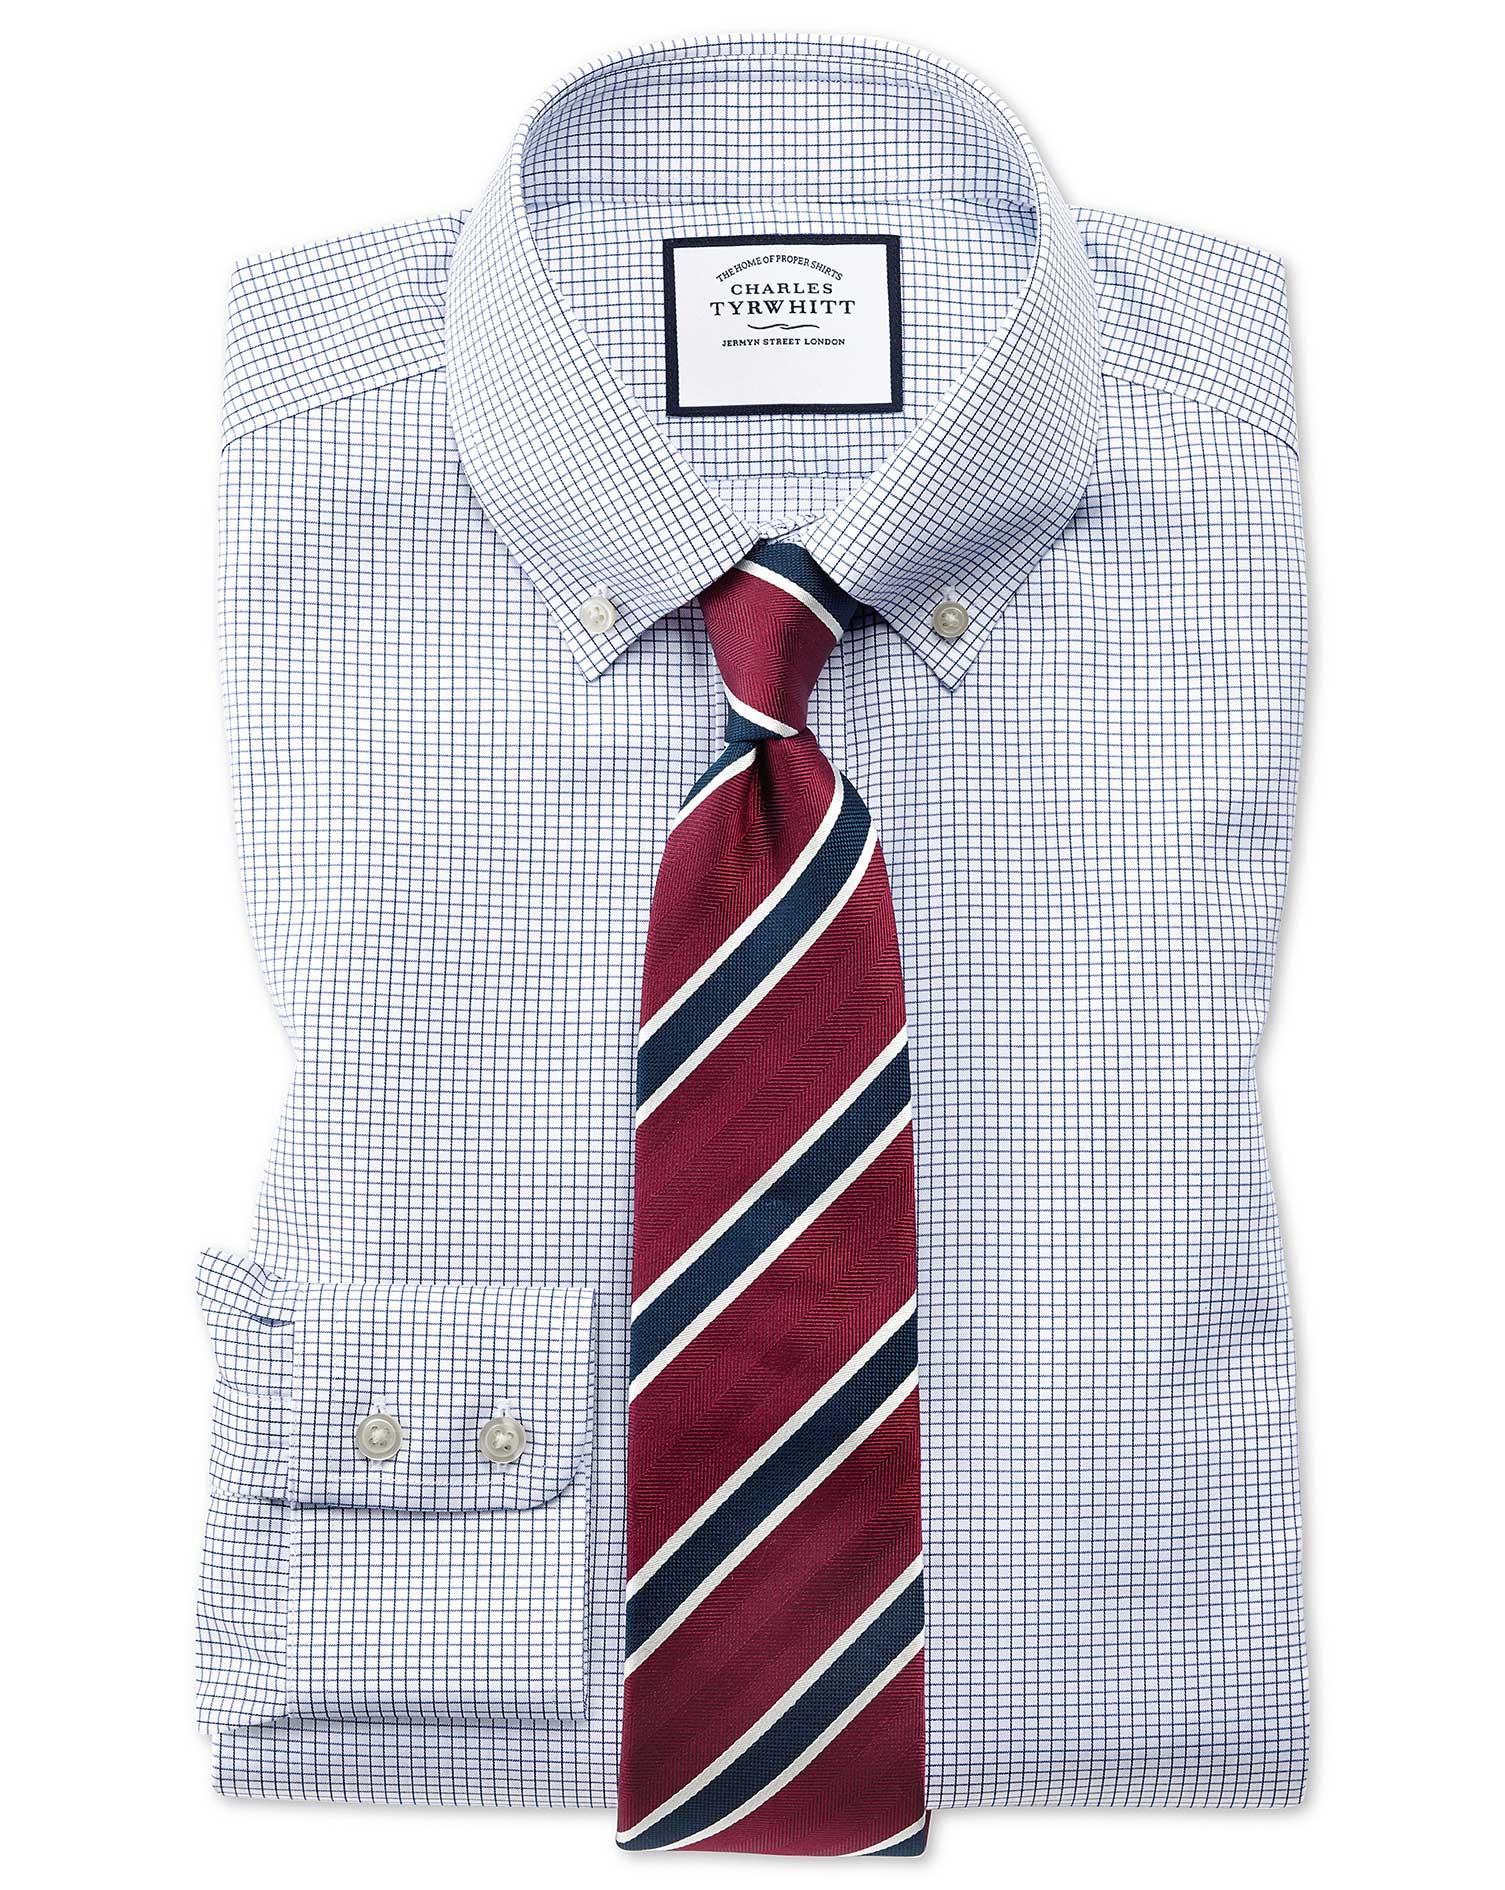 Extra Slim Fit Button-Down Non-Iron Twill Mini Grid Check Navy Cotton Formal Shirt Single Cuff Size